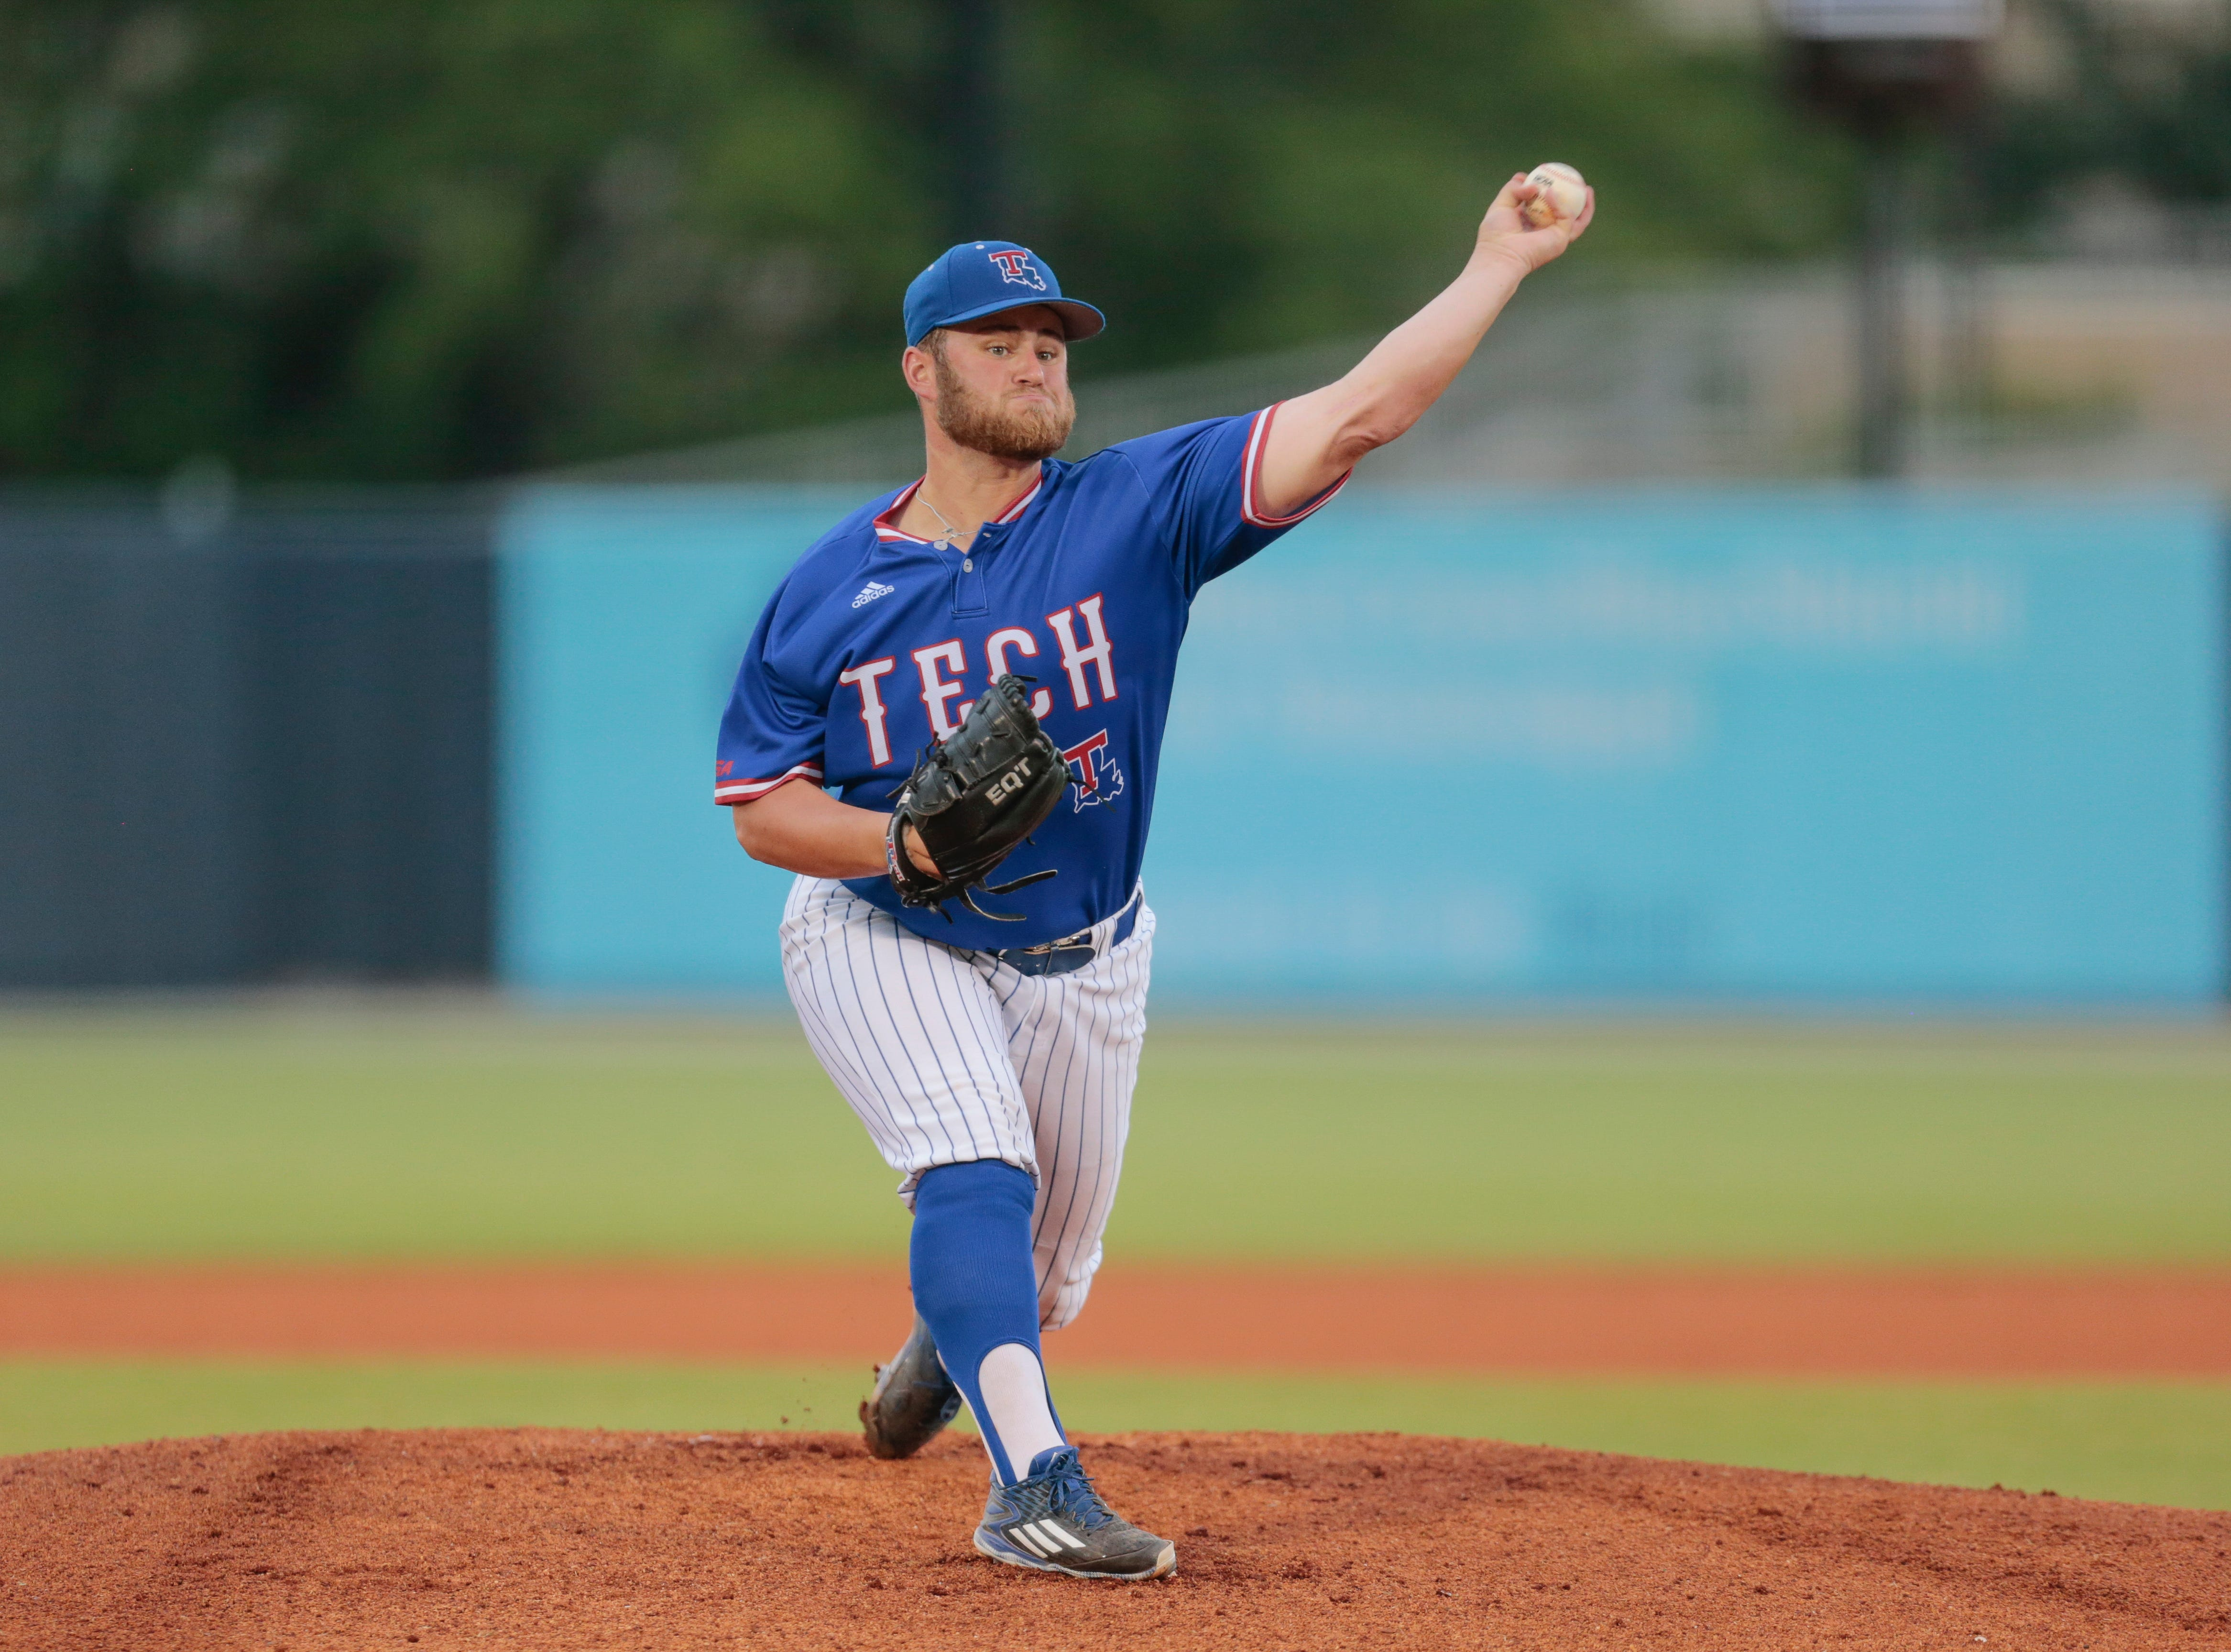 Louisiana Tech wallops Marshall to earn series